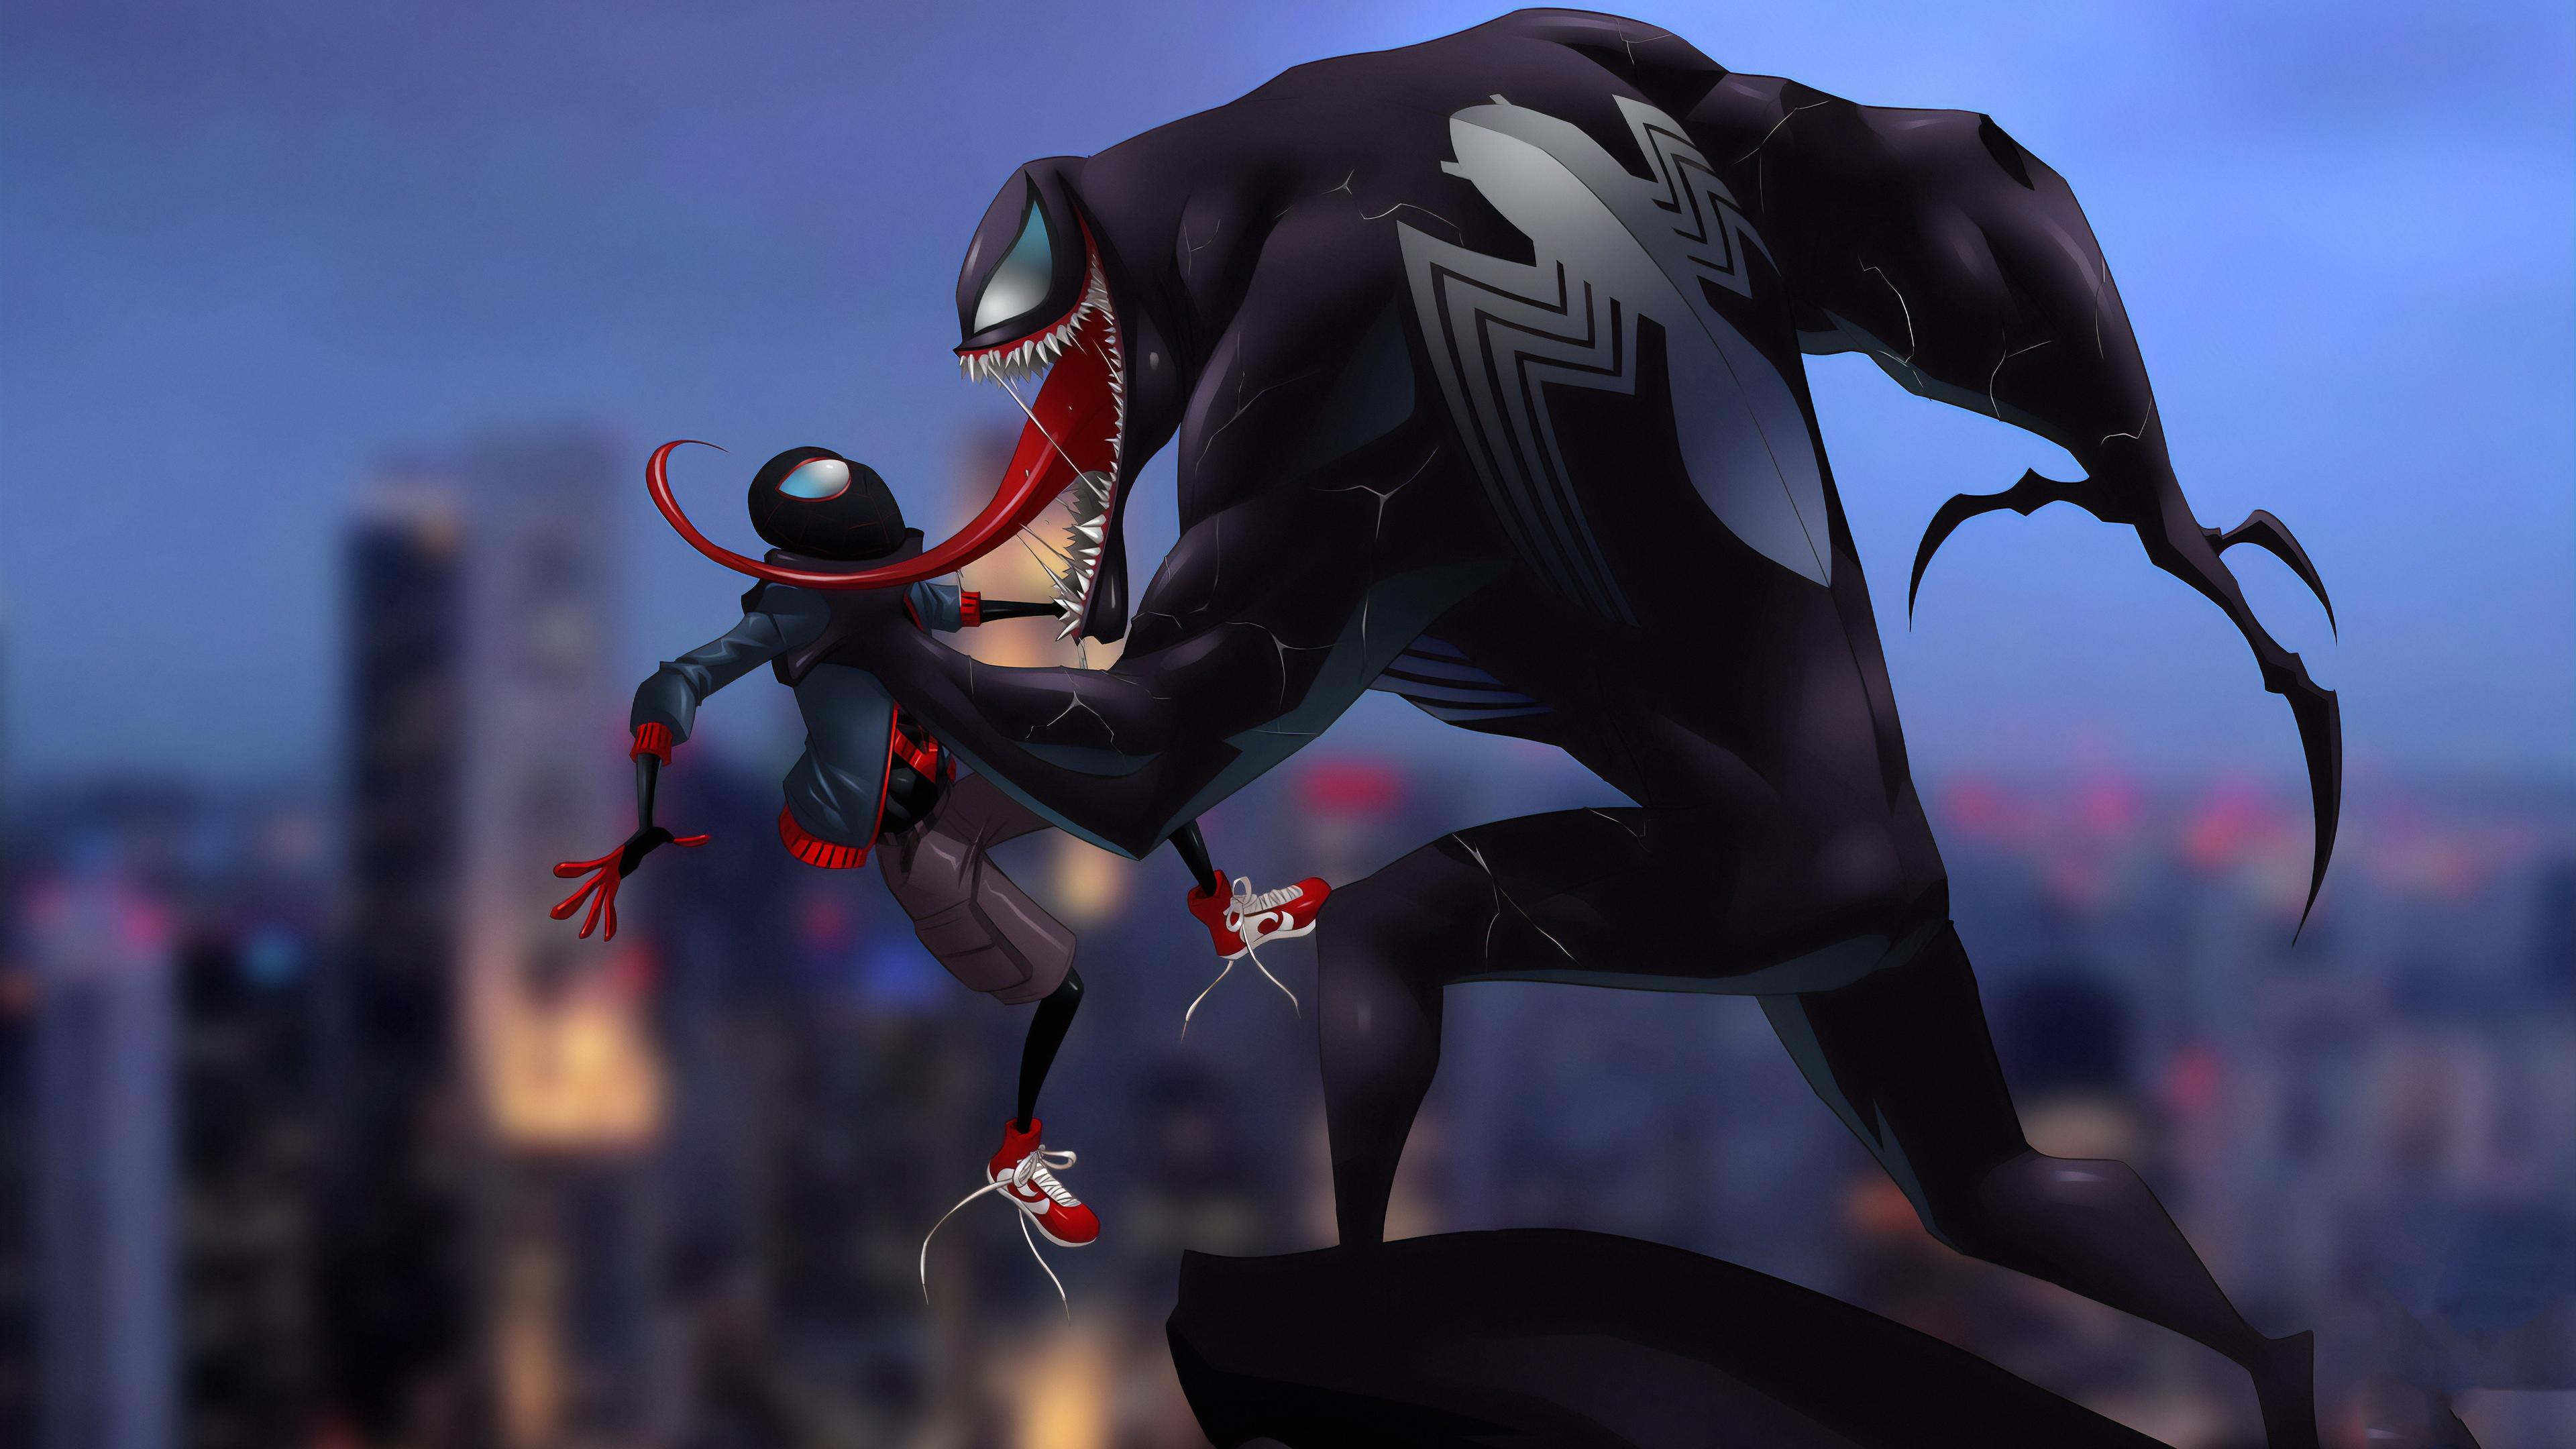 Wallpaper 4k Spider Man And Venom 4k Wallpapers Hd Wallpapers